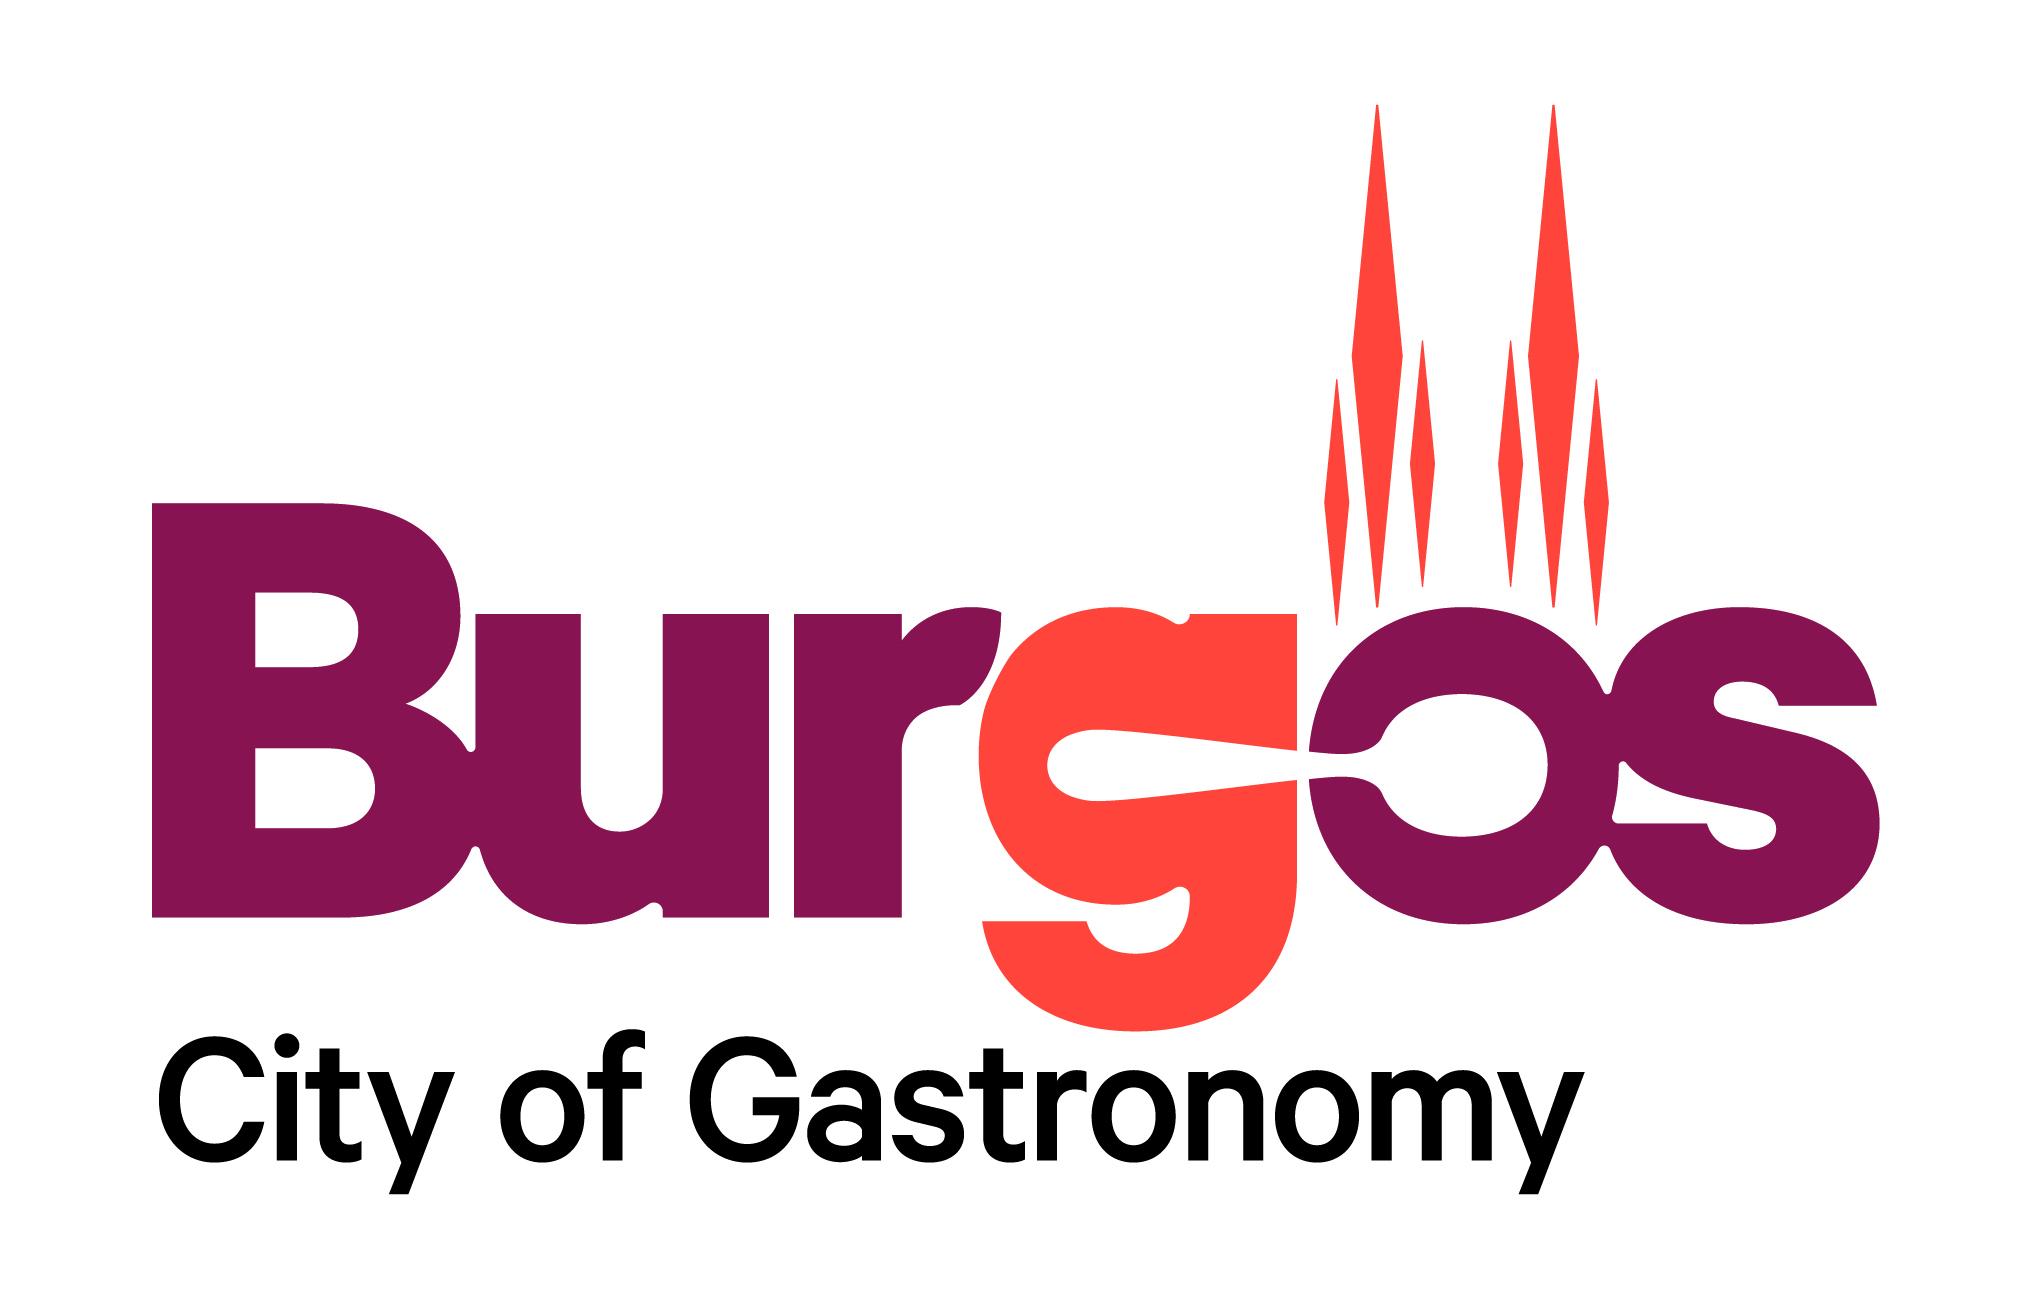 BURGOS CITY OF GASTRONOMY